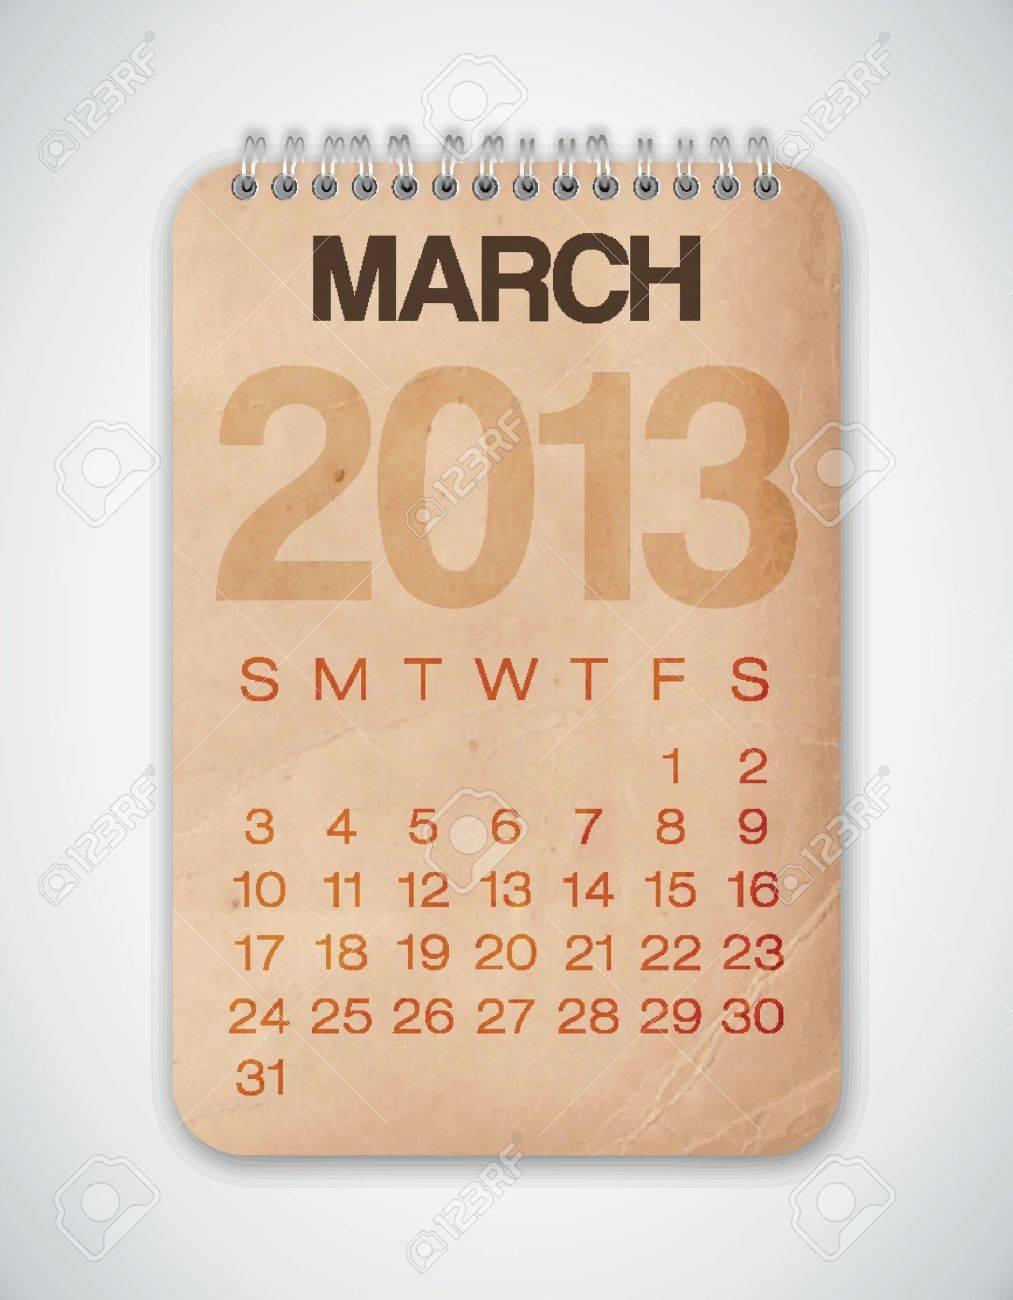 2013 Calendar March Grunge Texture Stock Vector - 15433108